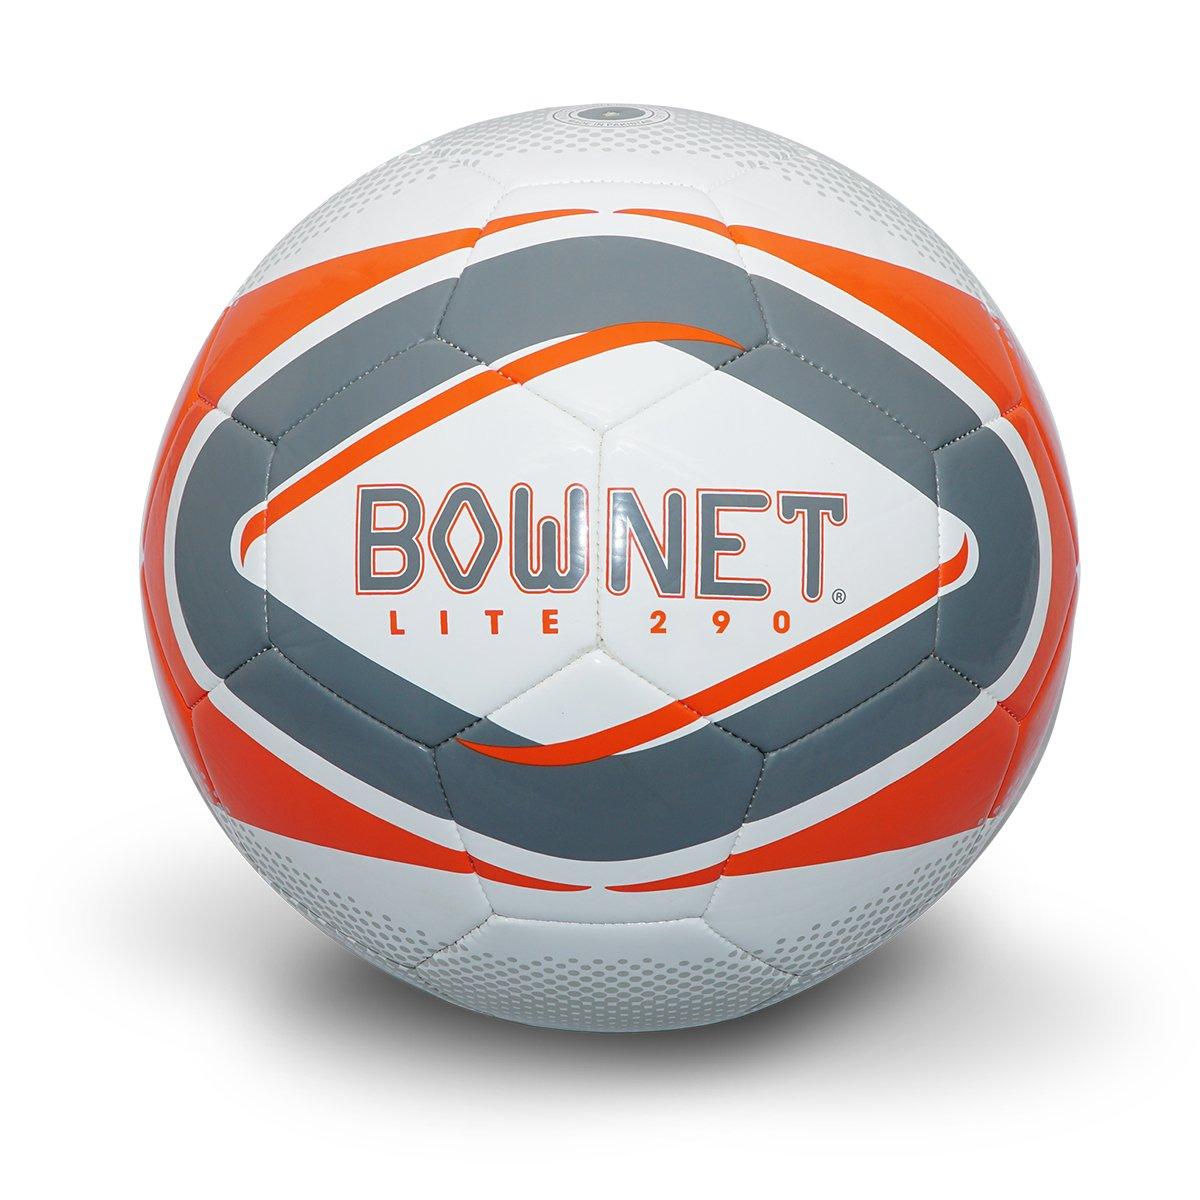 BownetサッカーボールLite – Increase自信、コントロール、元フライトwith Liteボールテクノロジー B077SVW7QD Size 5